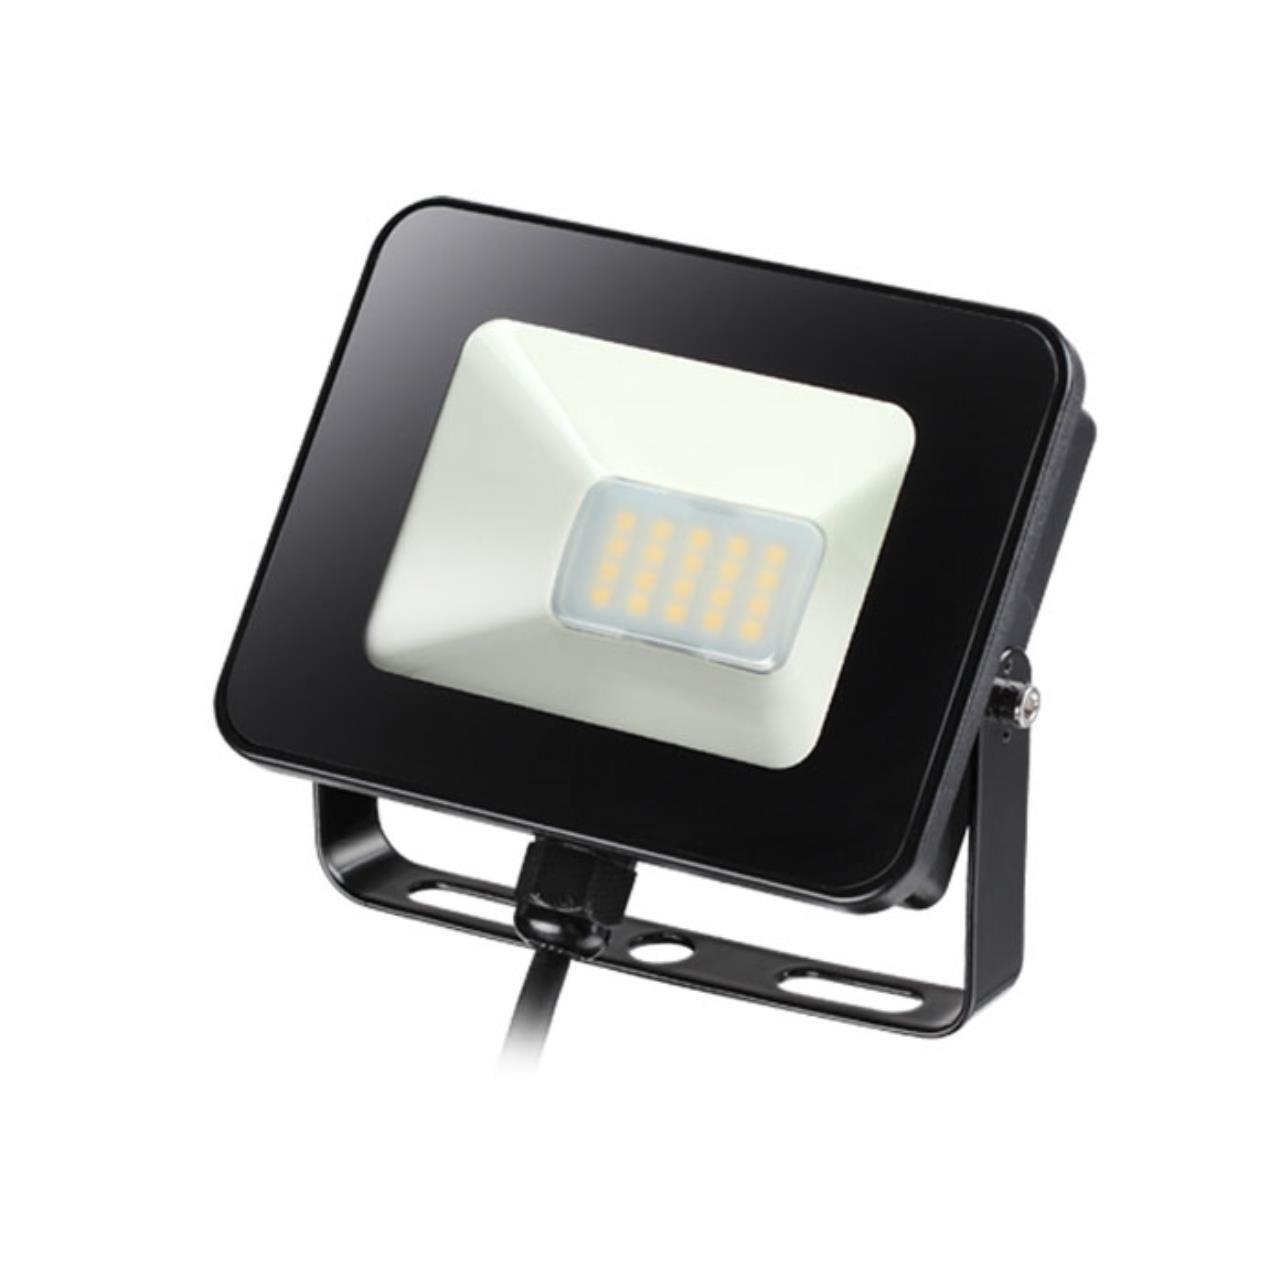 357525 STREET NT18 176 черный Ландшафтный прожектор IP65 LED 4000K 10W 220-240V ARMIN